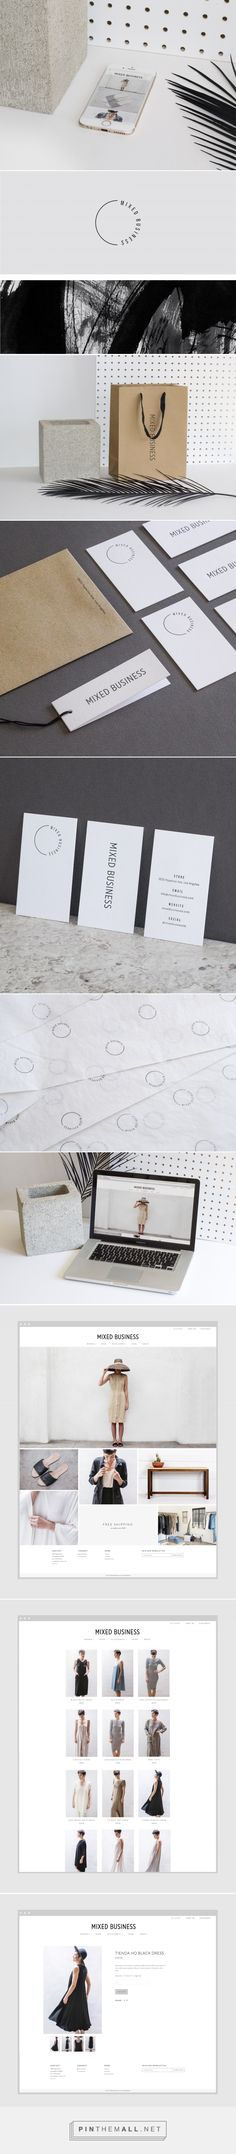 Mixed Business Branding by Kati Forner | Fivestar Branding – Design and Branding Agency & Inspiration Gallery